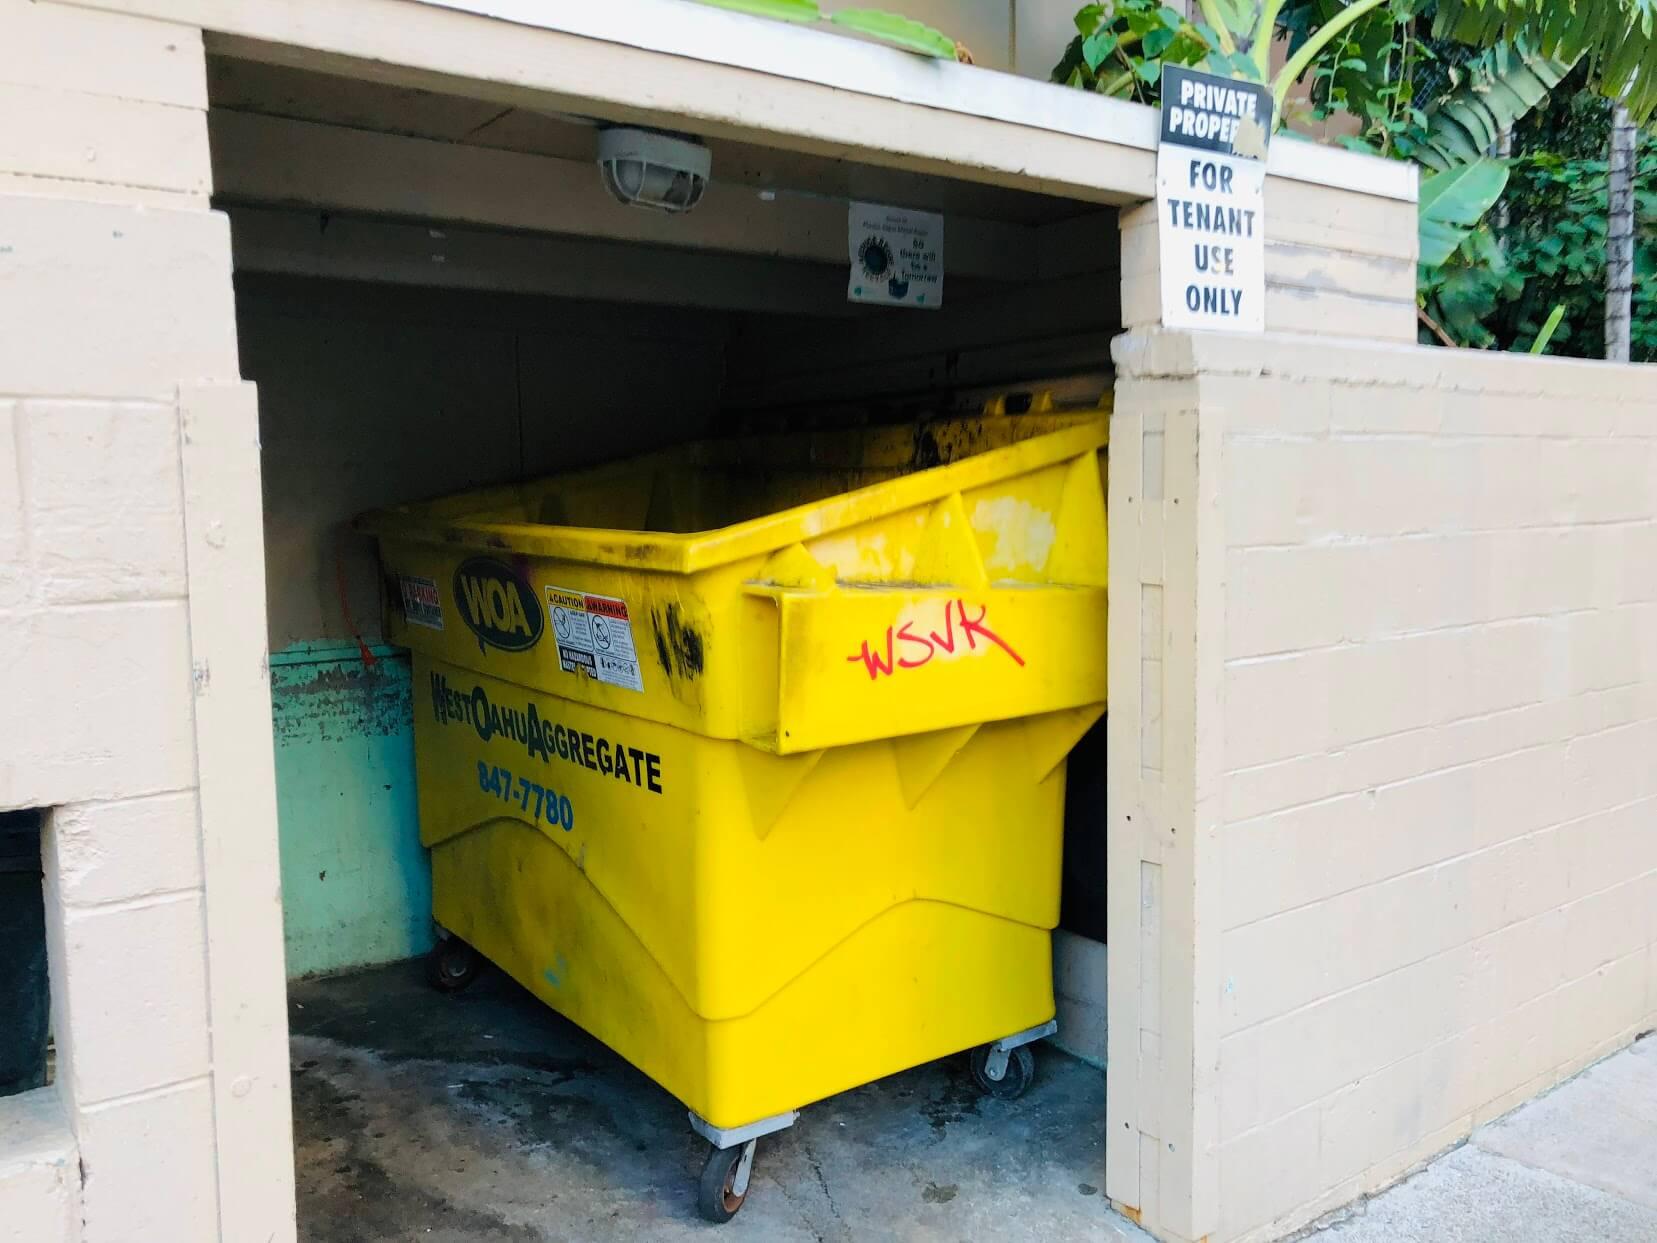 Laniakea Apartmentsのゴミ集積場